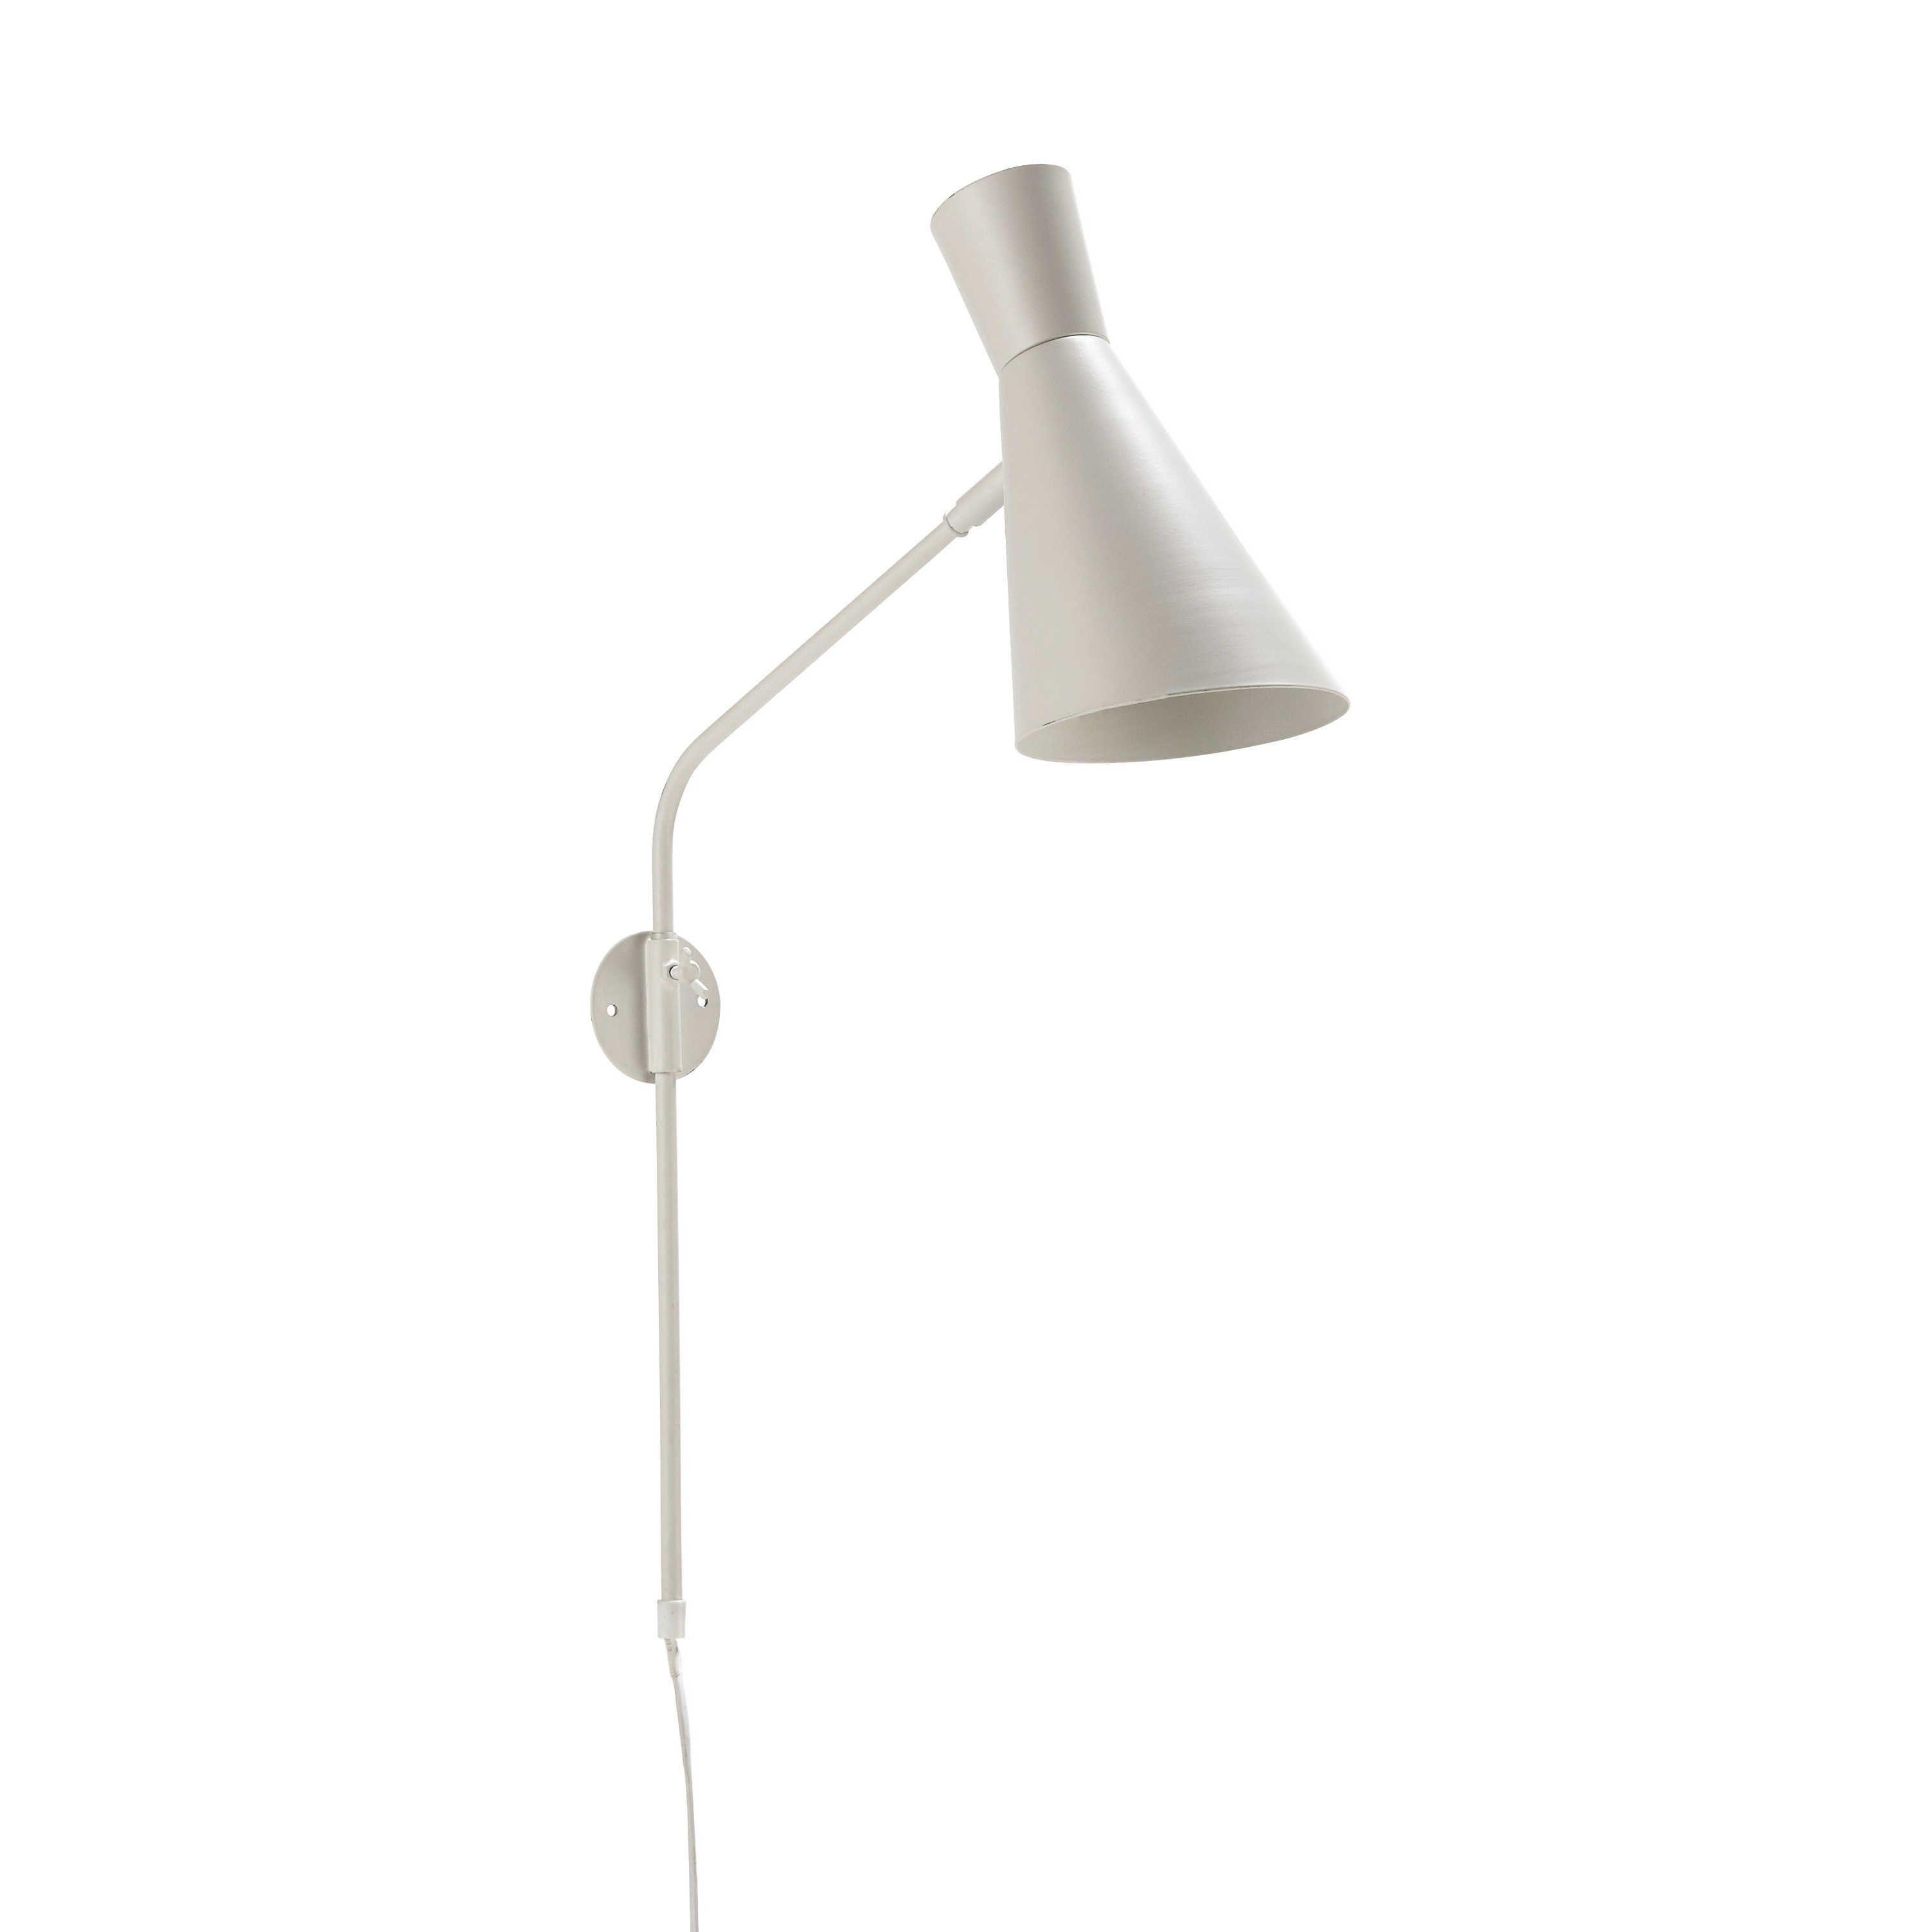 Applique en métal blanche H 65 cm HARRIS LighTiNg